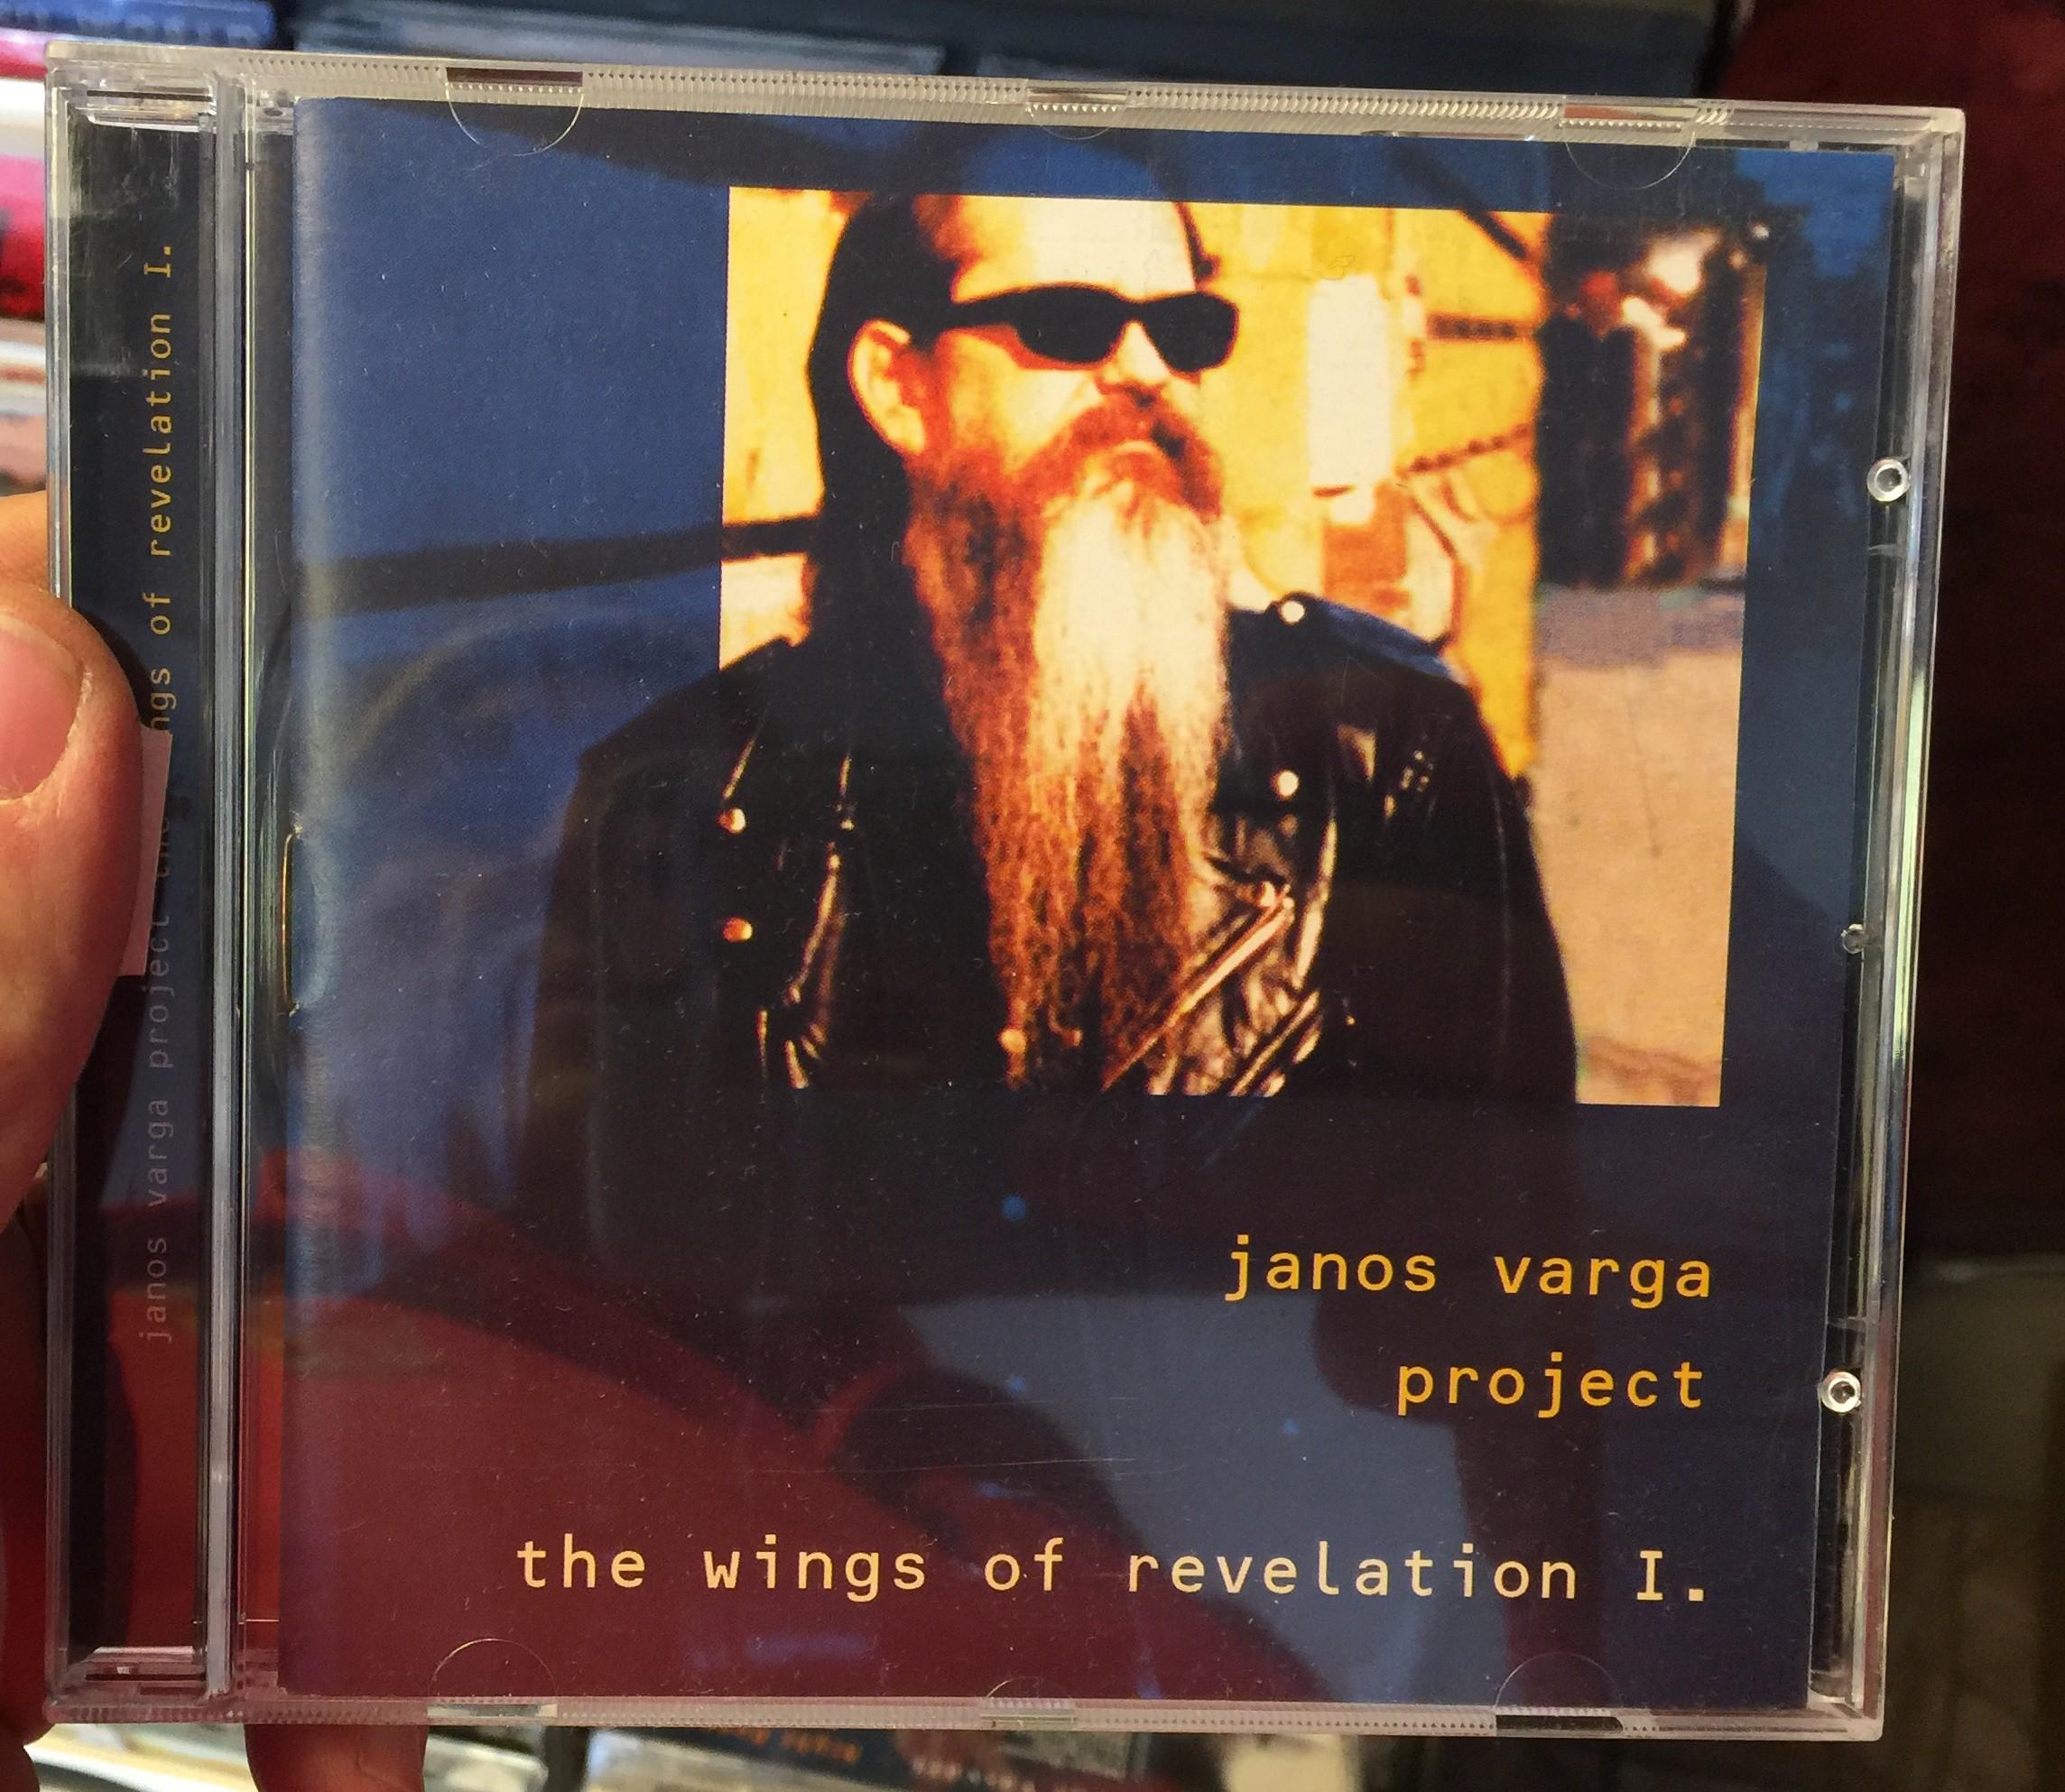 janos-varga-project-the-wings-of-revelation-i.-periferic-records-audio-cd-2000-bgcd-064-1-.jpg